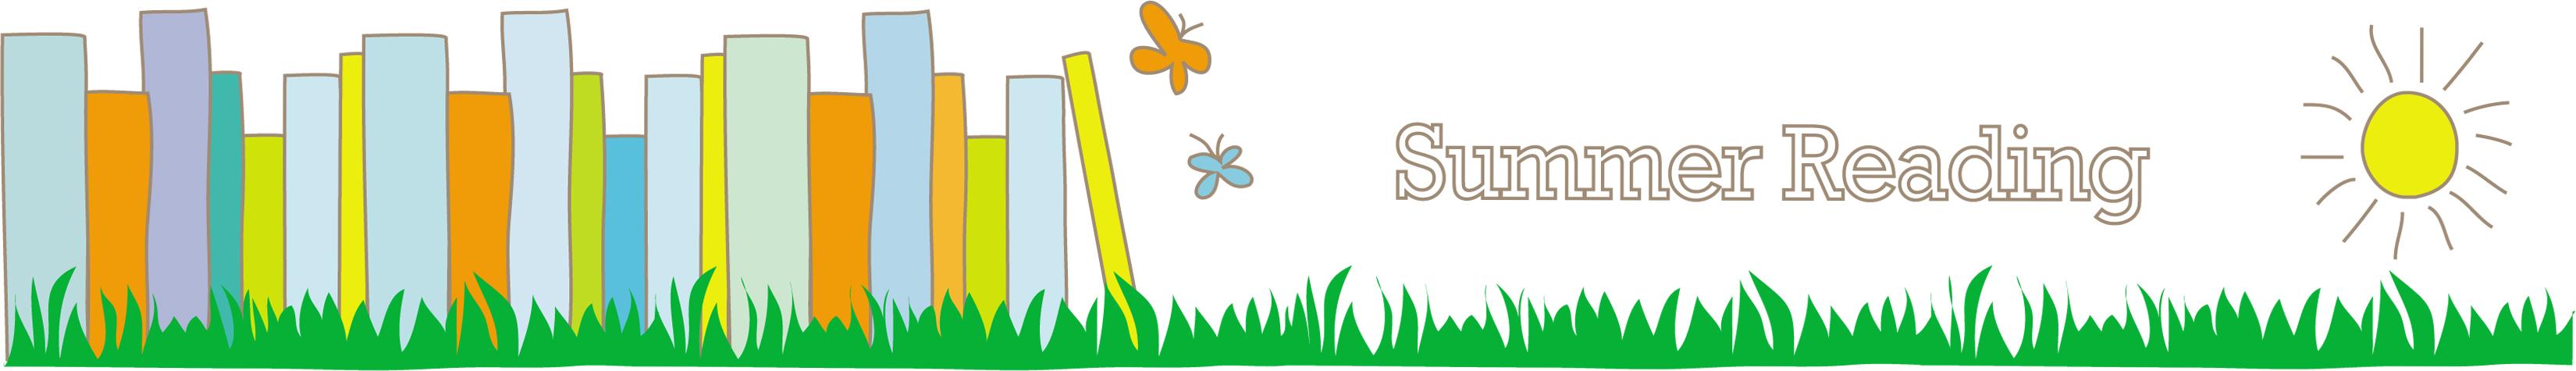 Image result for summer reading banner